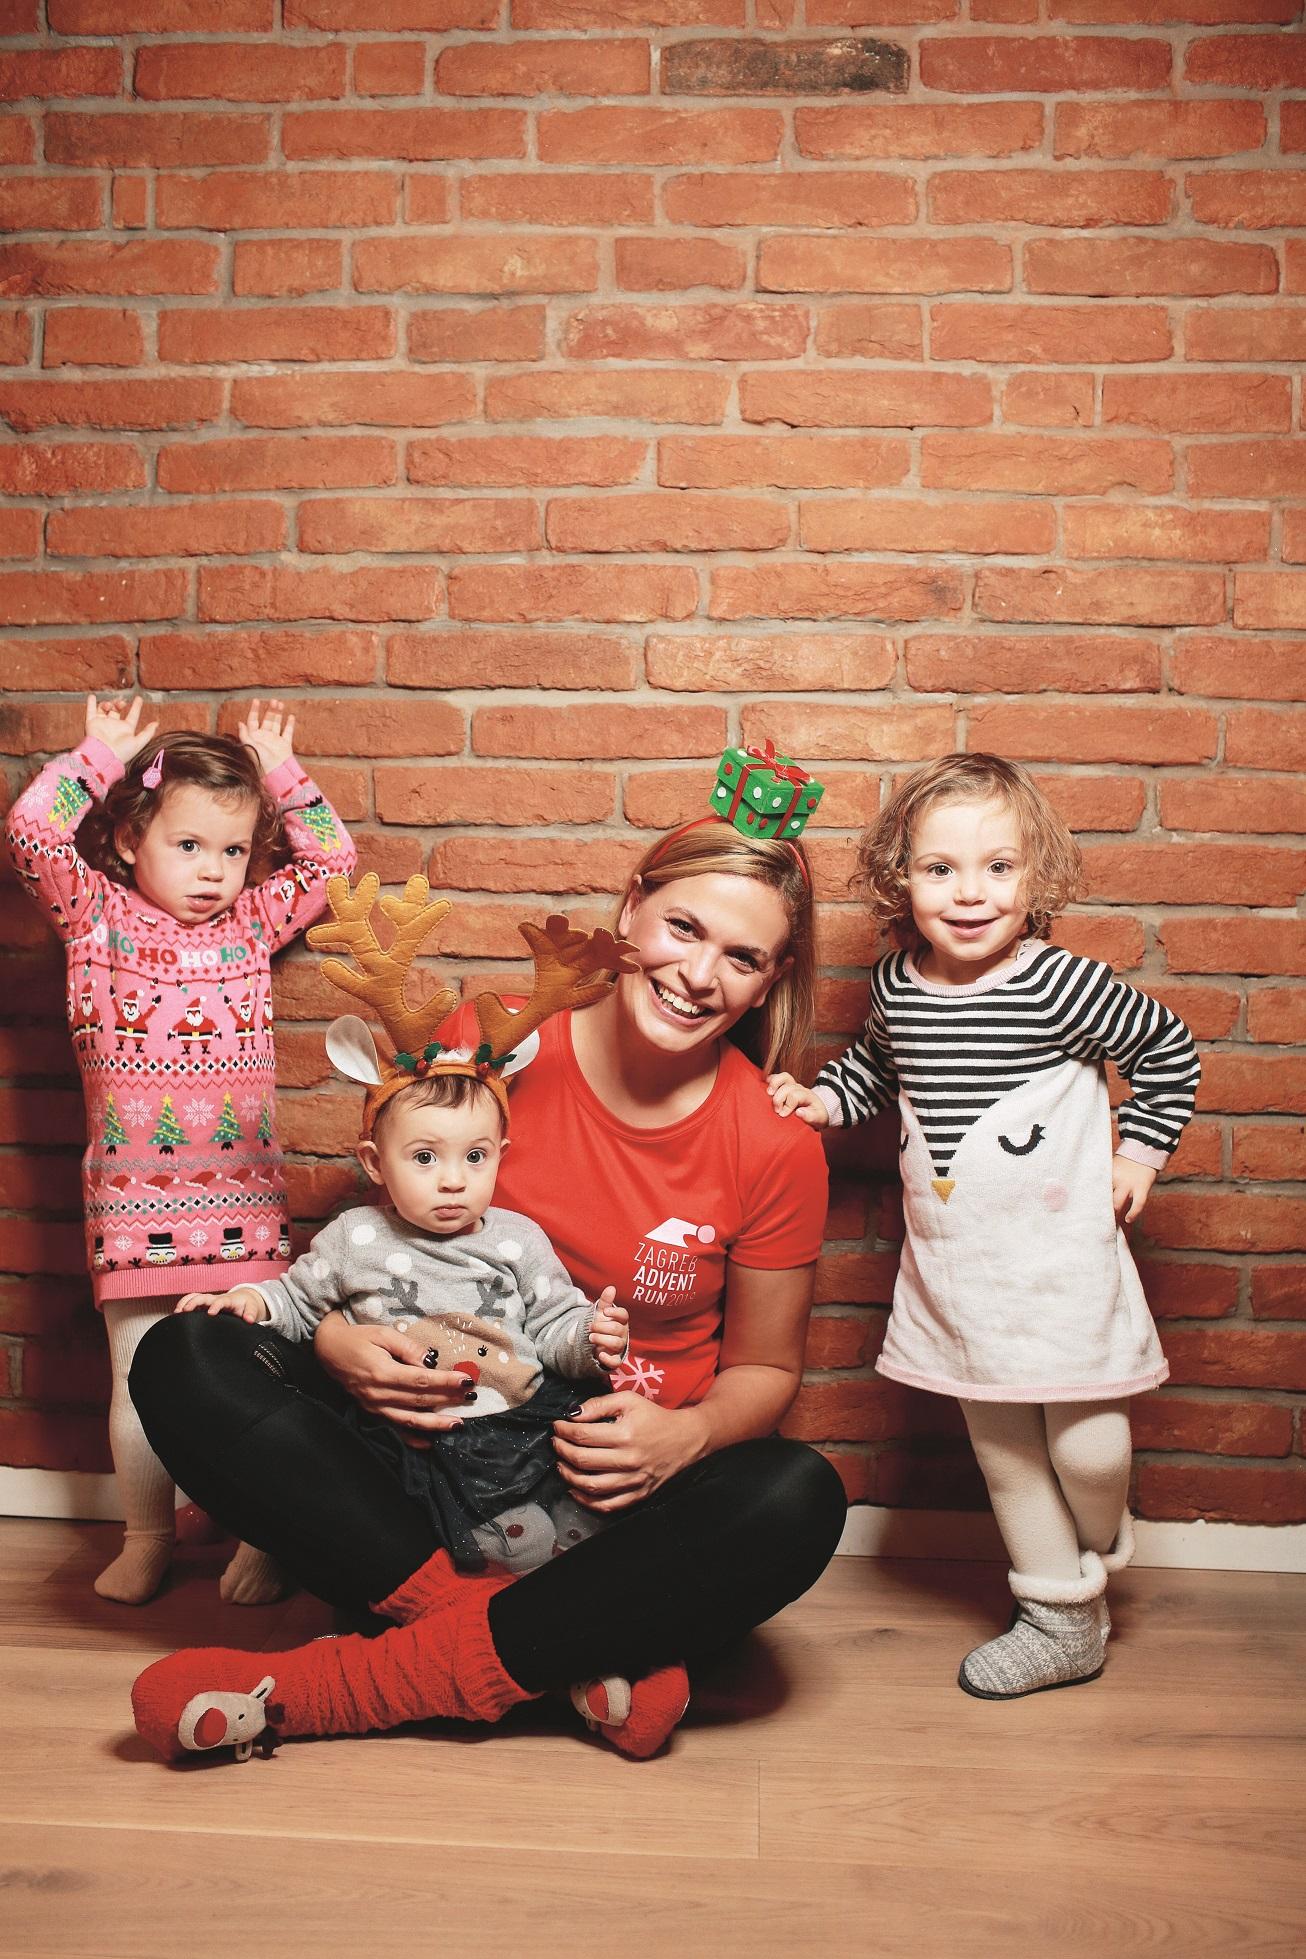 zagreb 25.11.2019 Doris Pincic i Nevena Rendeli s djecom foto vedran peteh